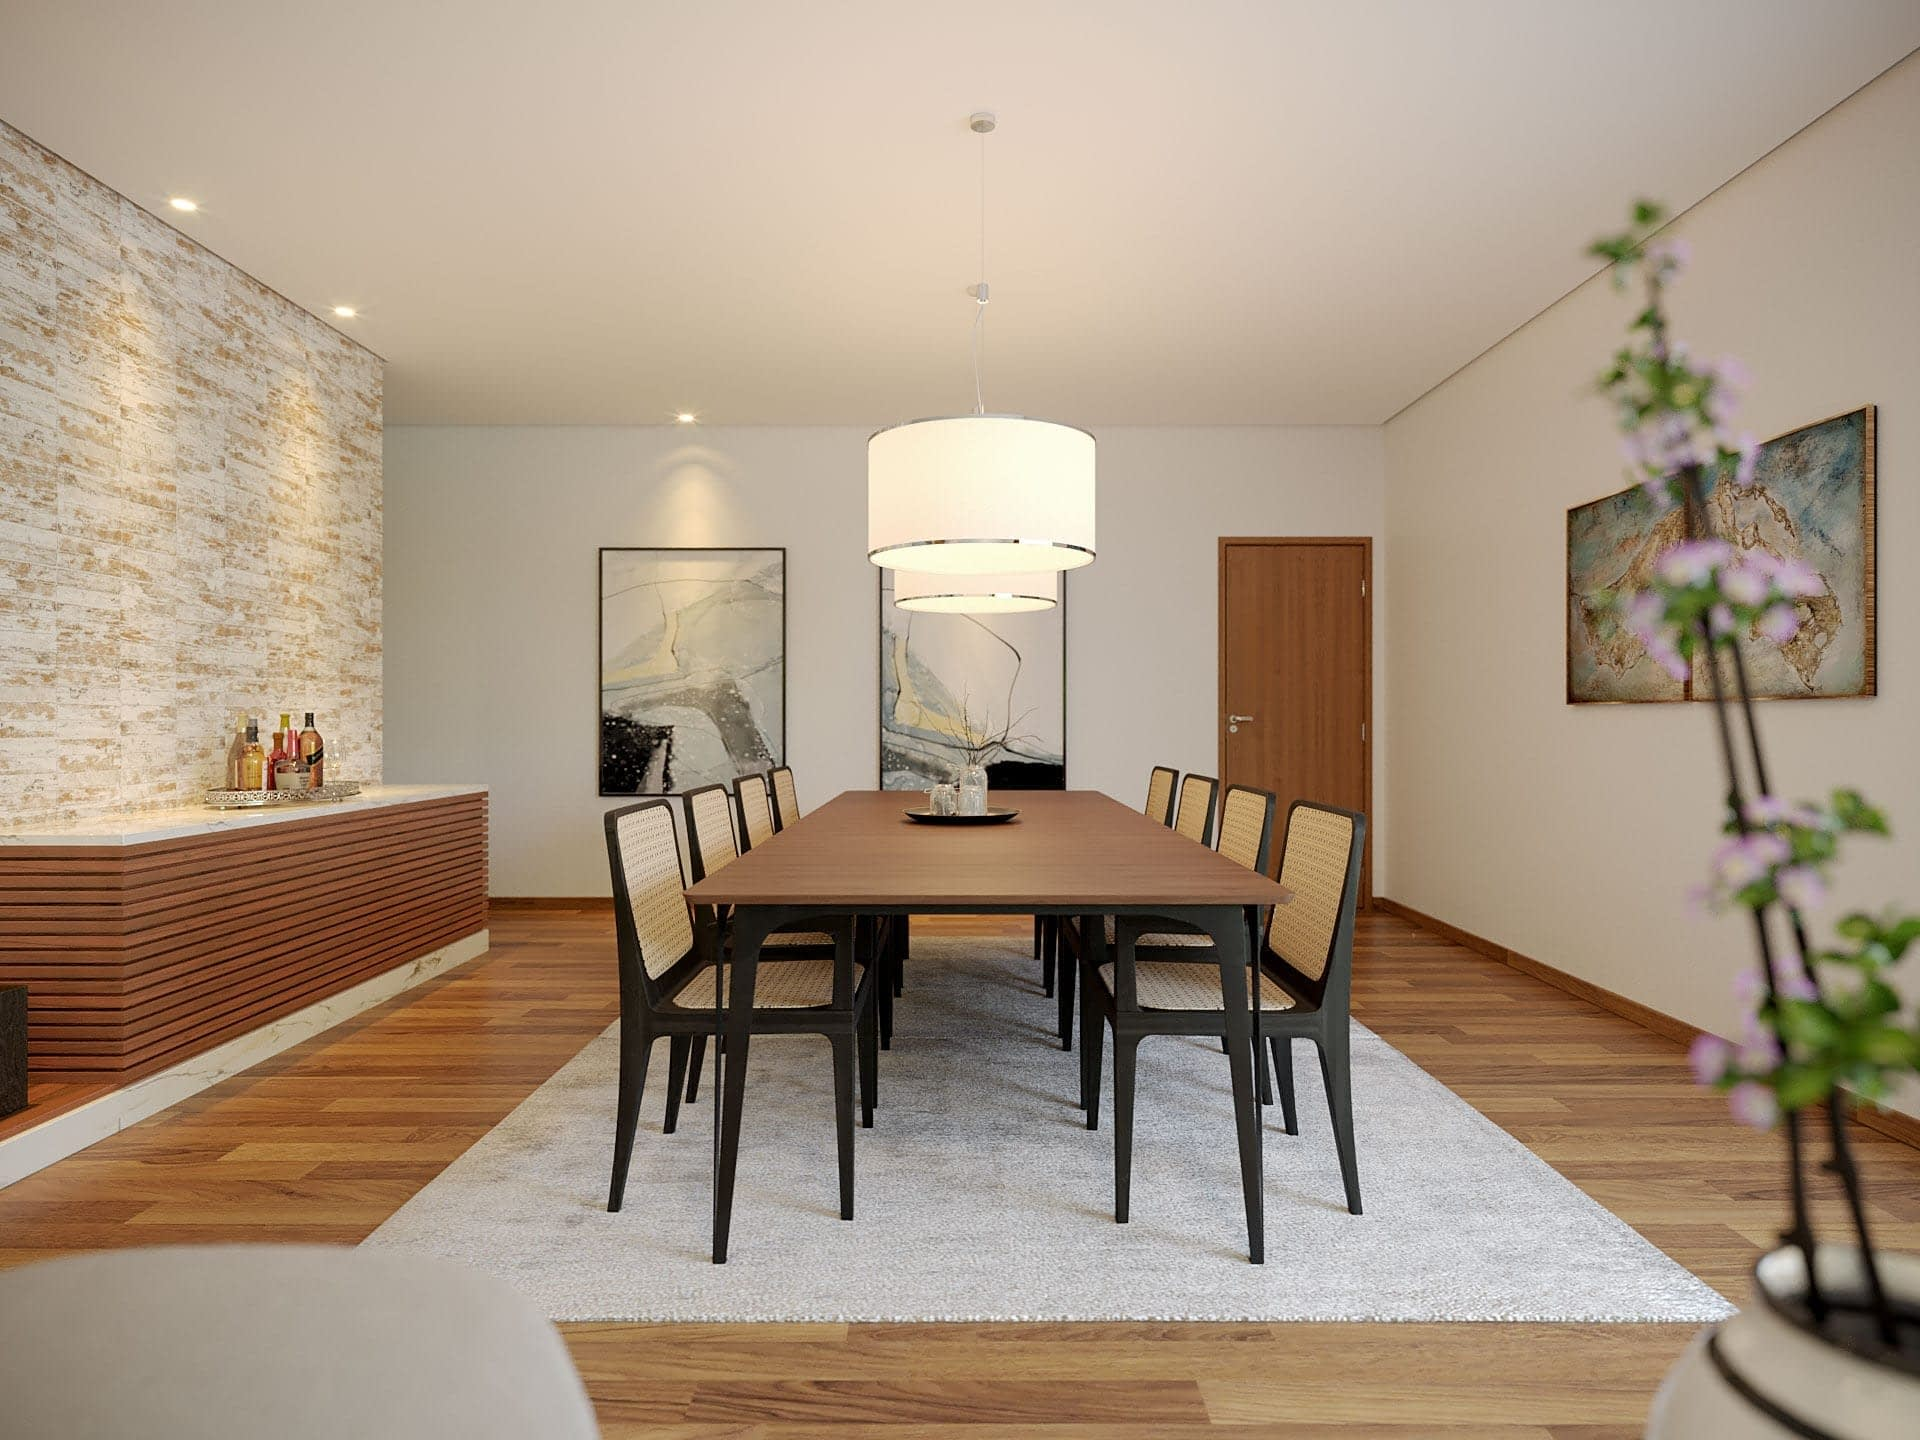 Arquiteta Beatriz Teixeira - Sala MALS